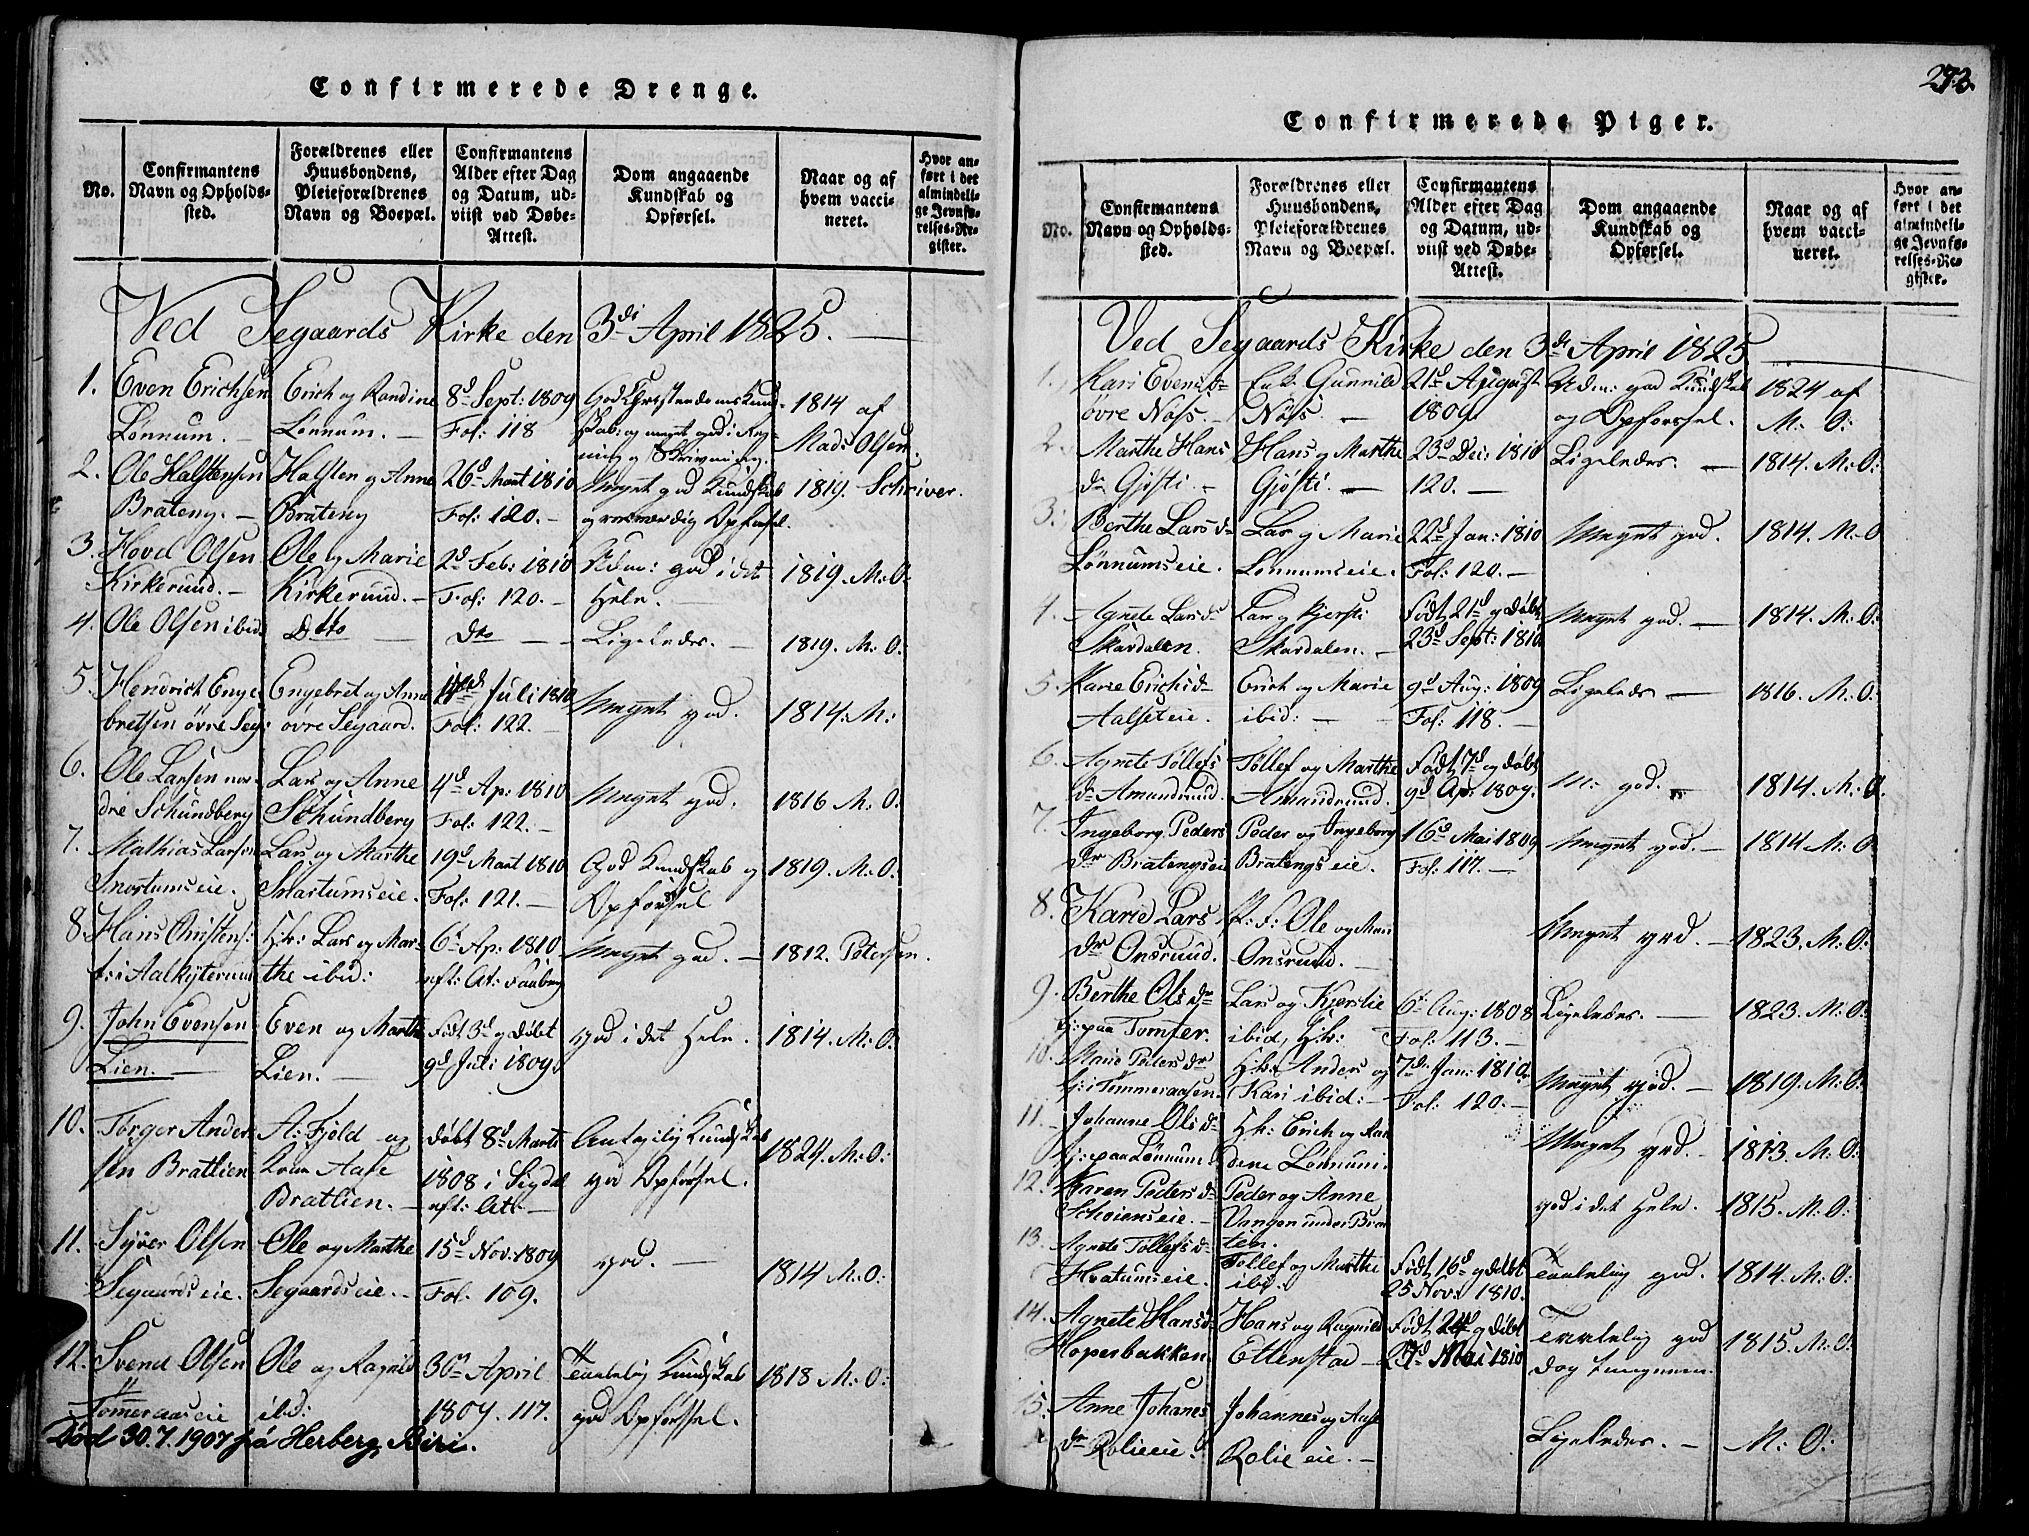 SAH, Biri prestekontor, Ministerialbok nr. 3, 1814-1828, s. 273